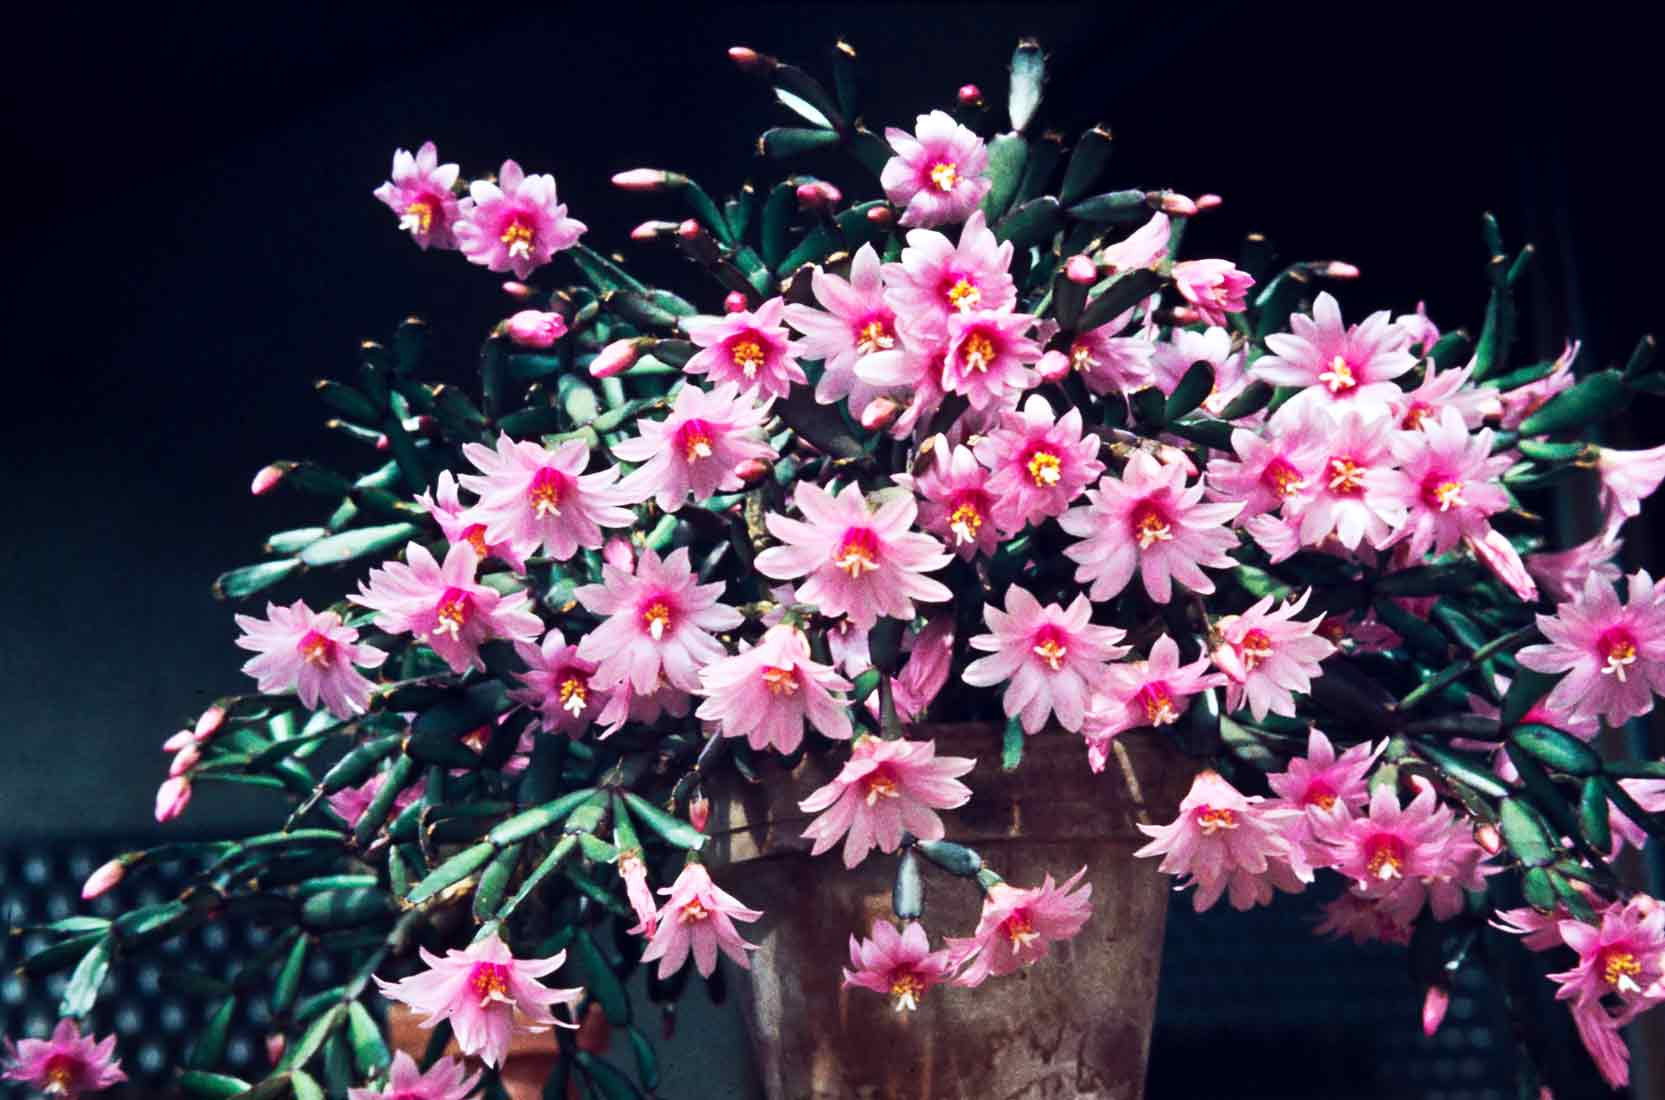 Rhipsalidopsis-rosea-1983